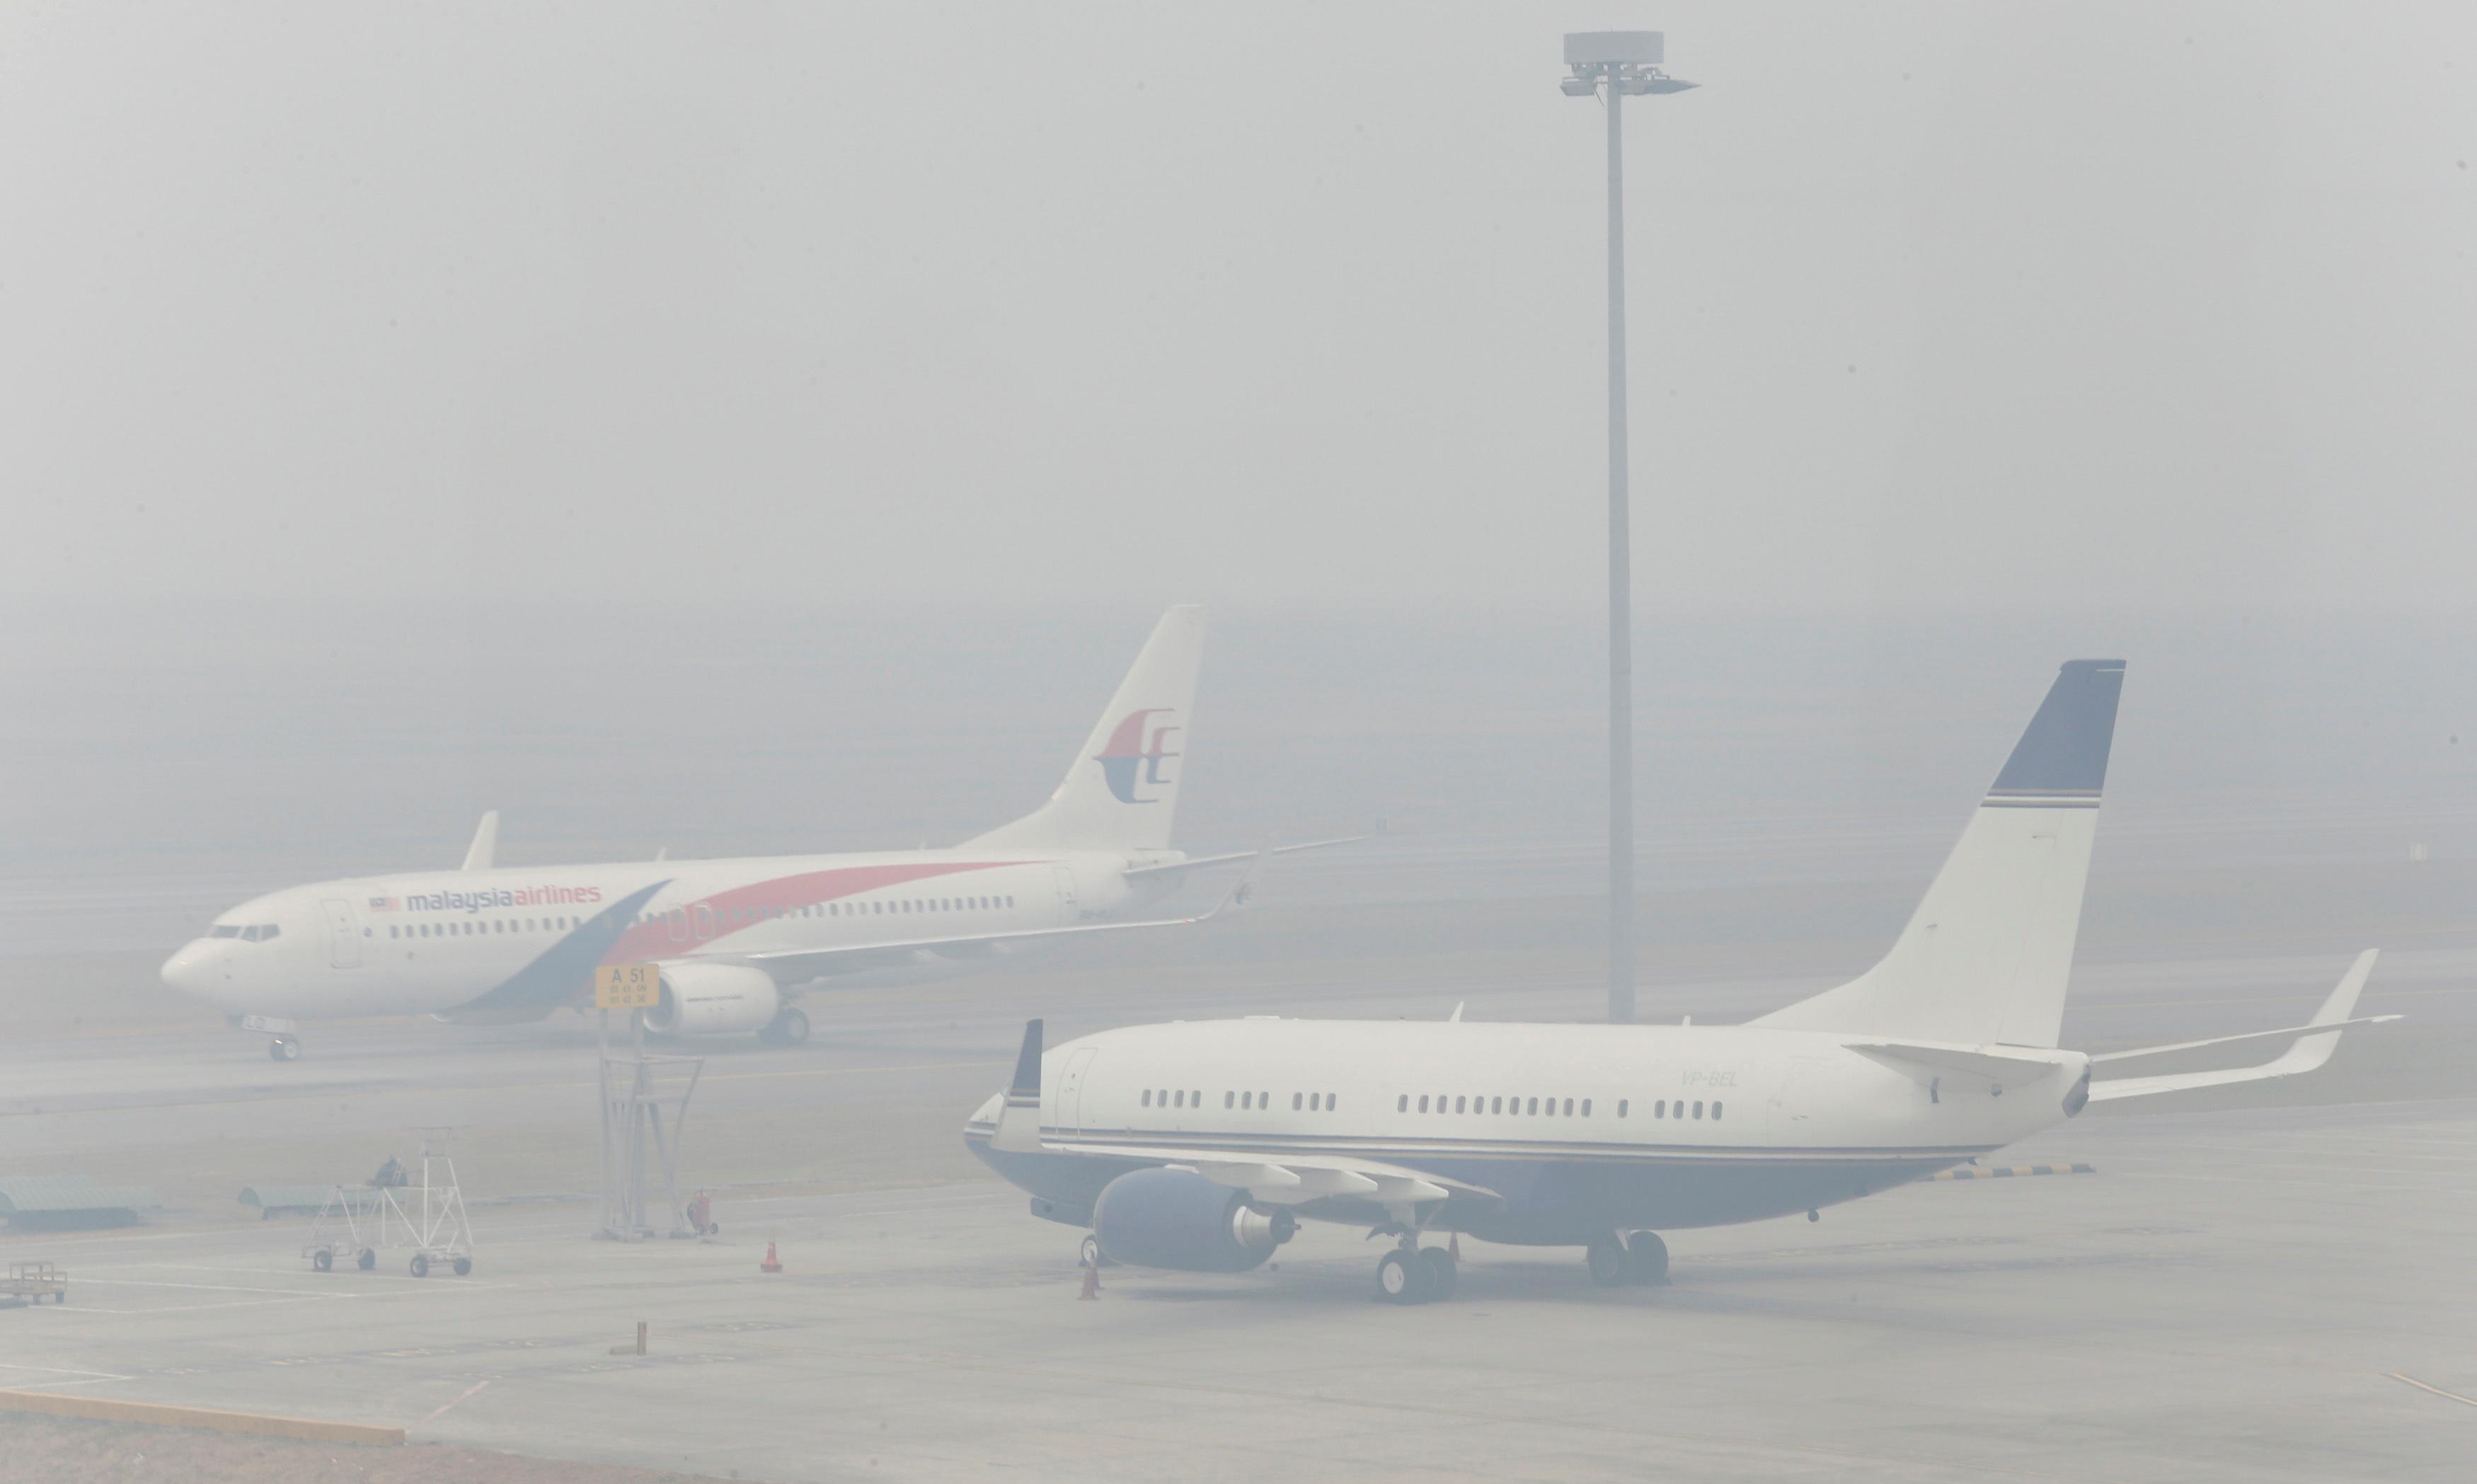 Airplanes are seen at the Kuala Lumpur International Airport in Sepang, on a hazy day outside Kuala Lumpur June 24, 2013. REUTERS/Bazuki Muhammad/File Photo